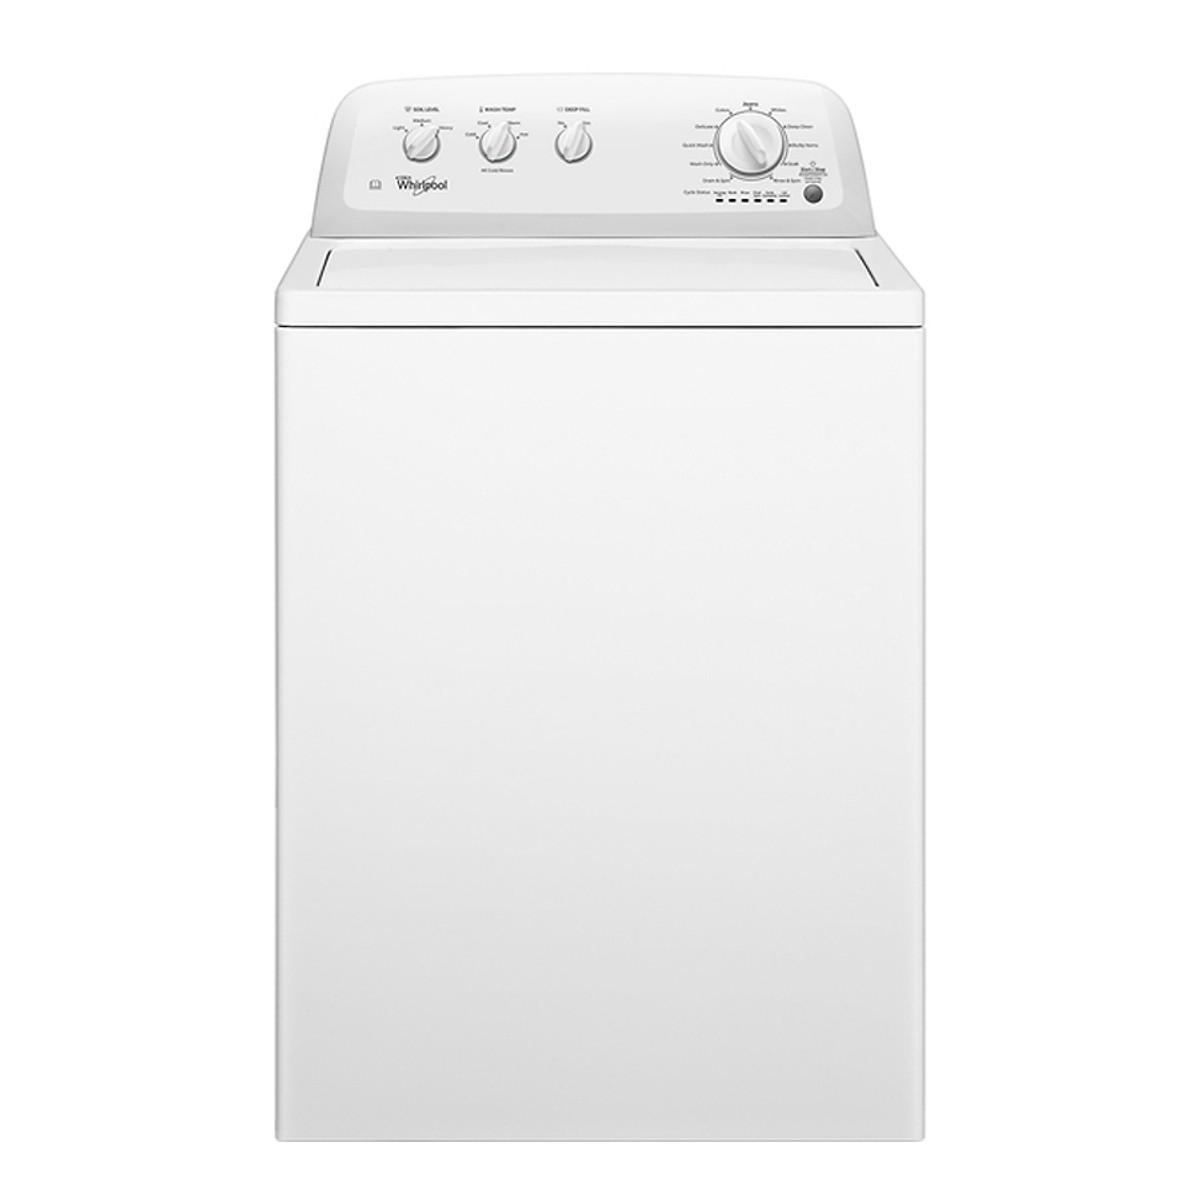 Máy Giặt Cửa Trên Whirlpool 3LWTW4705FW (15kg)